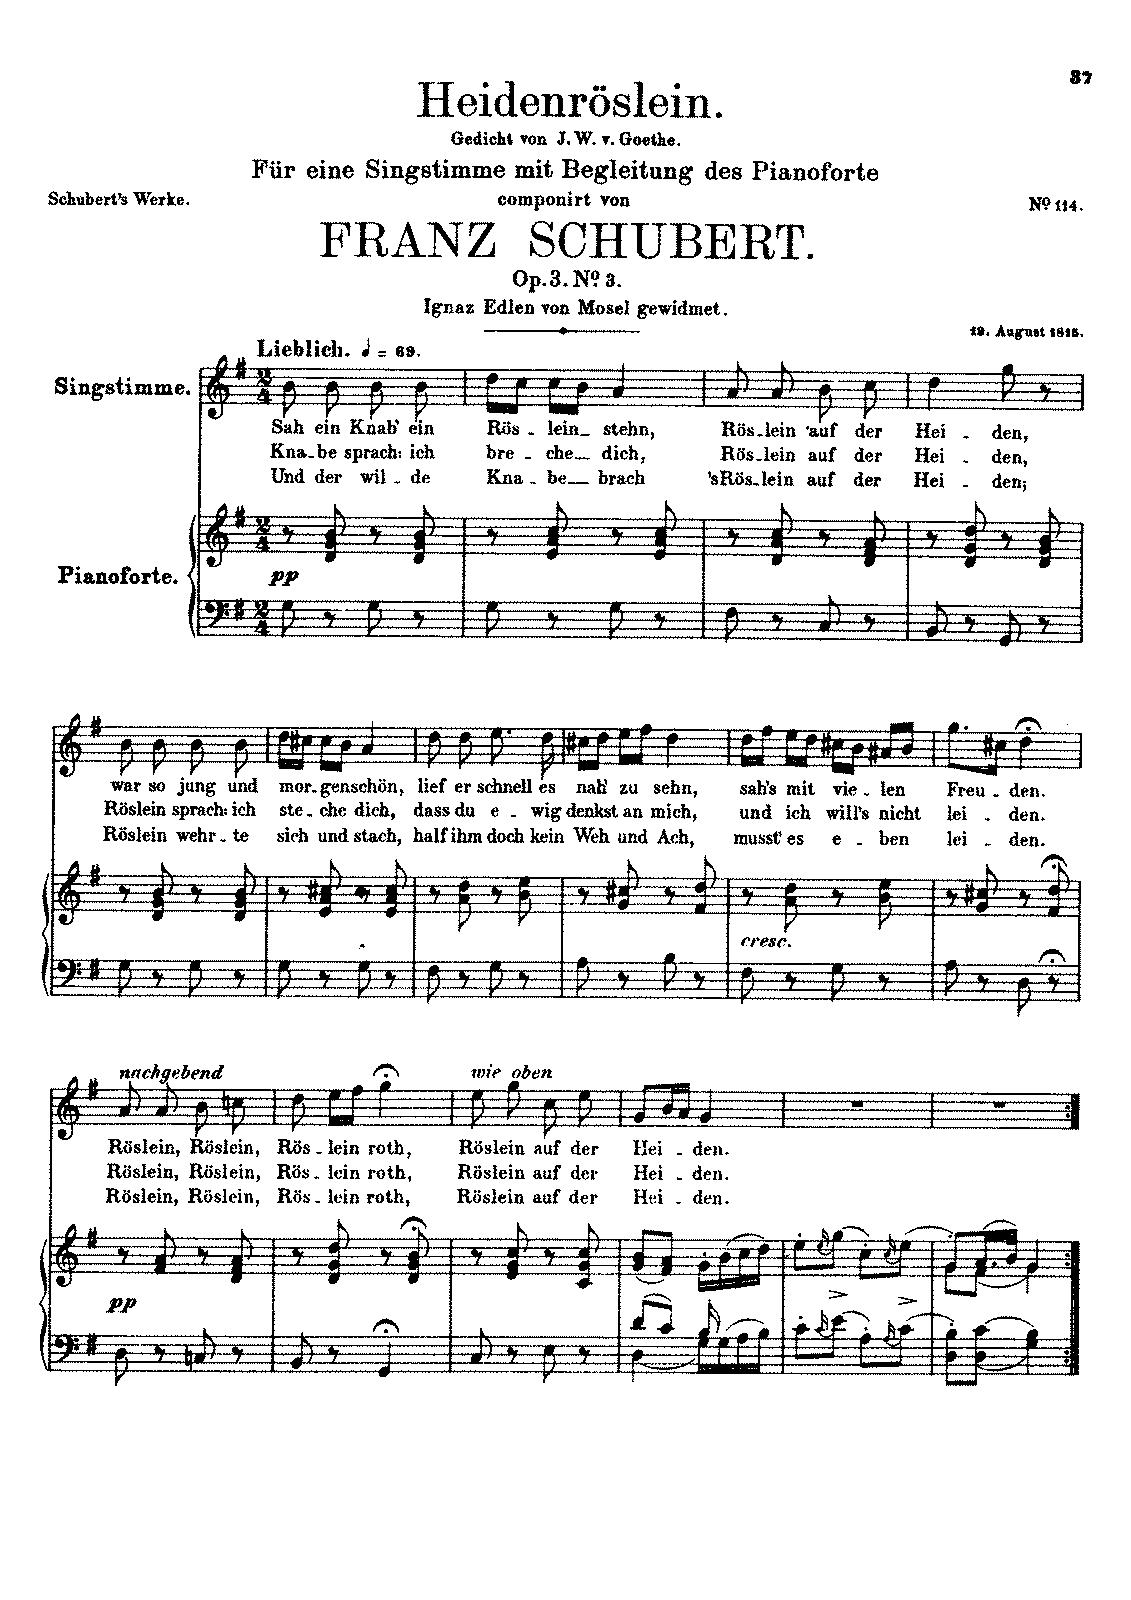 prometheus goethe gedichtinterpretation